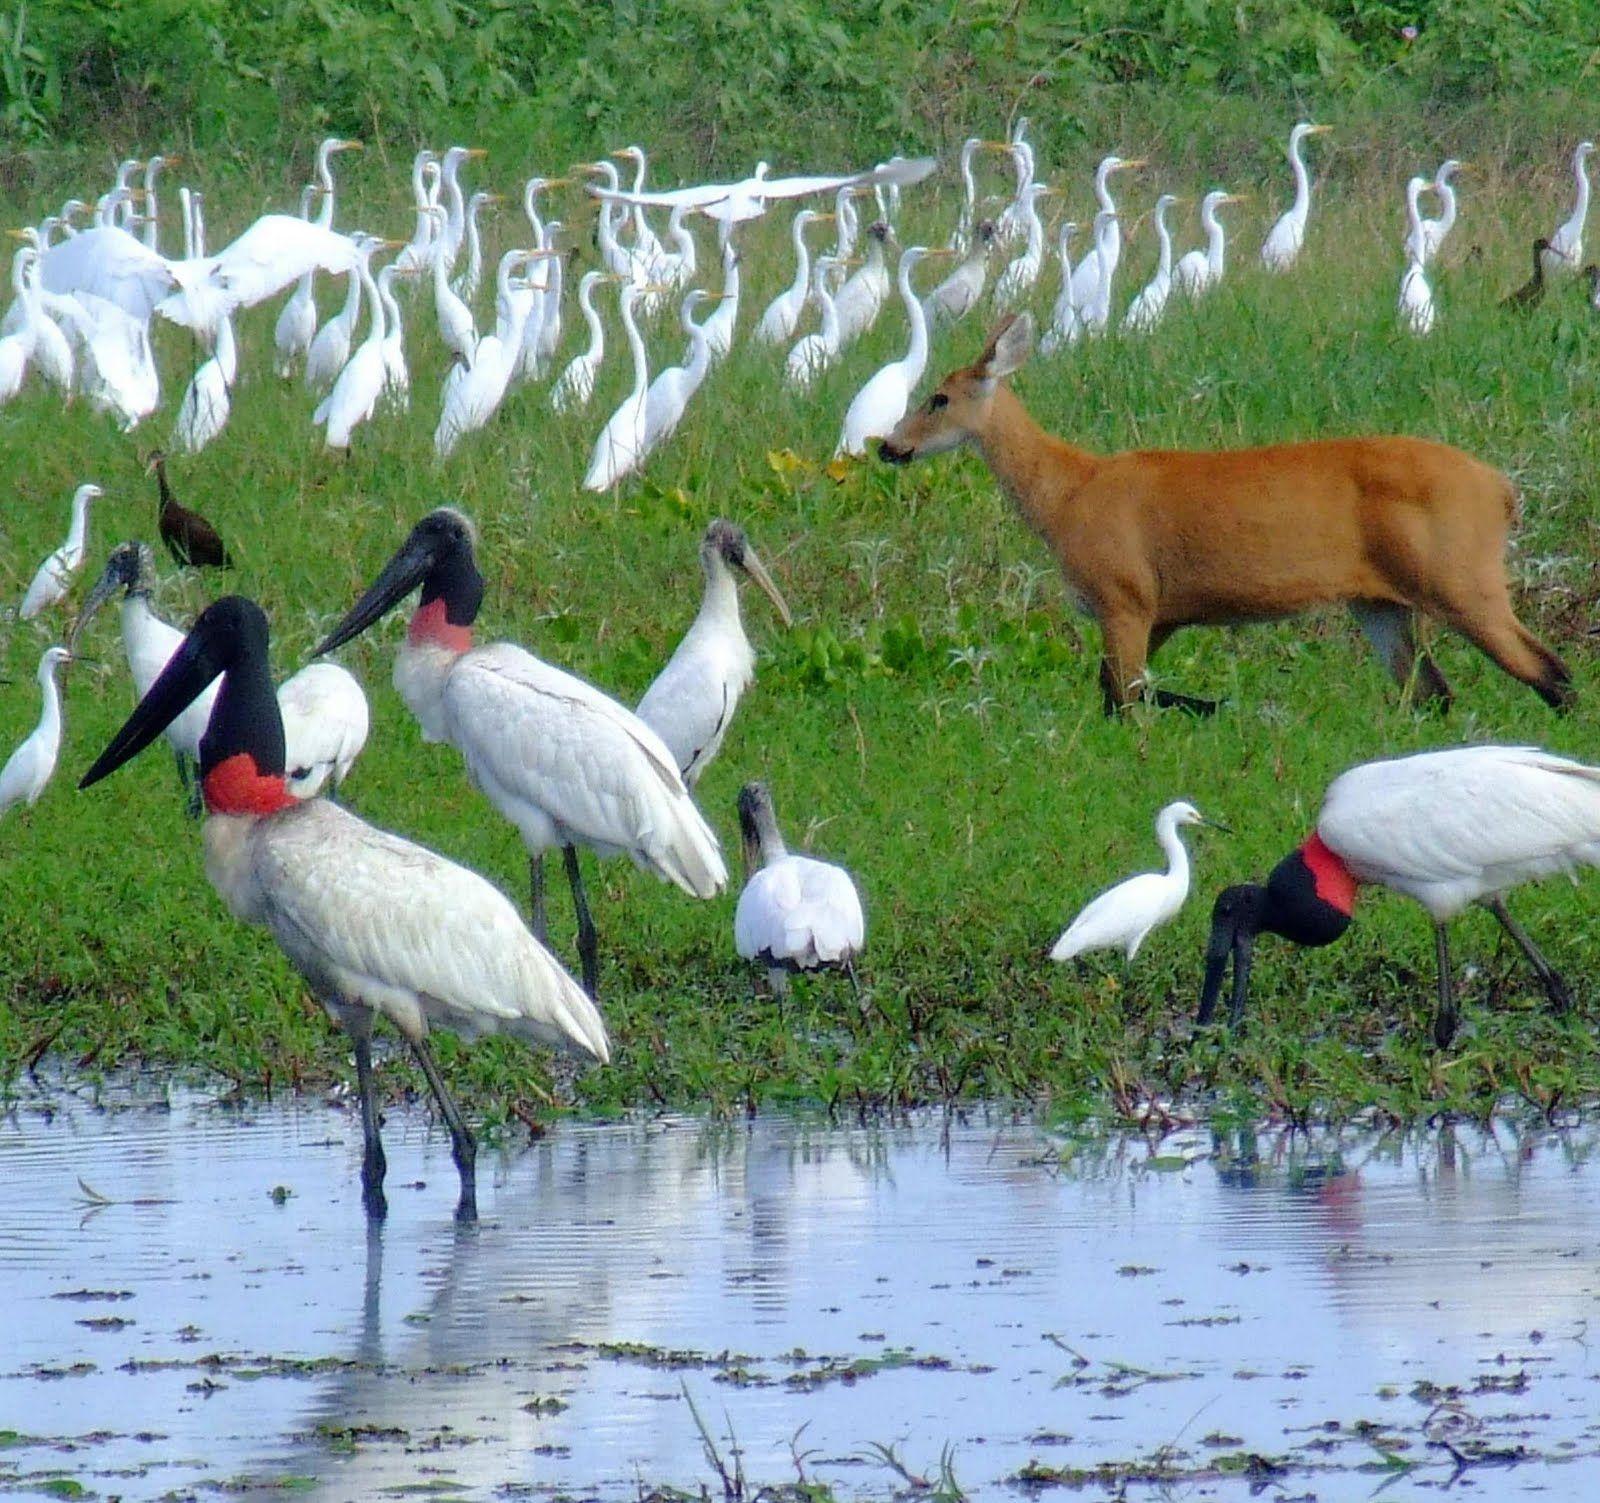 Fauna Do Pantanal Matogrossense Brasil Em 2020 Pantanal Matogrossense Pantanal Mato Grossense Pantanal Brazil